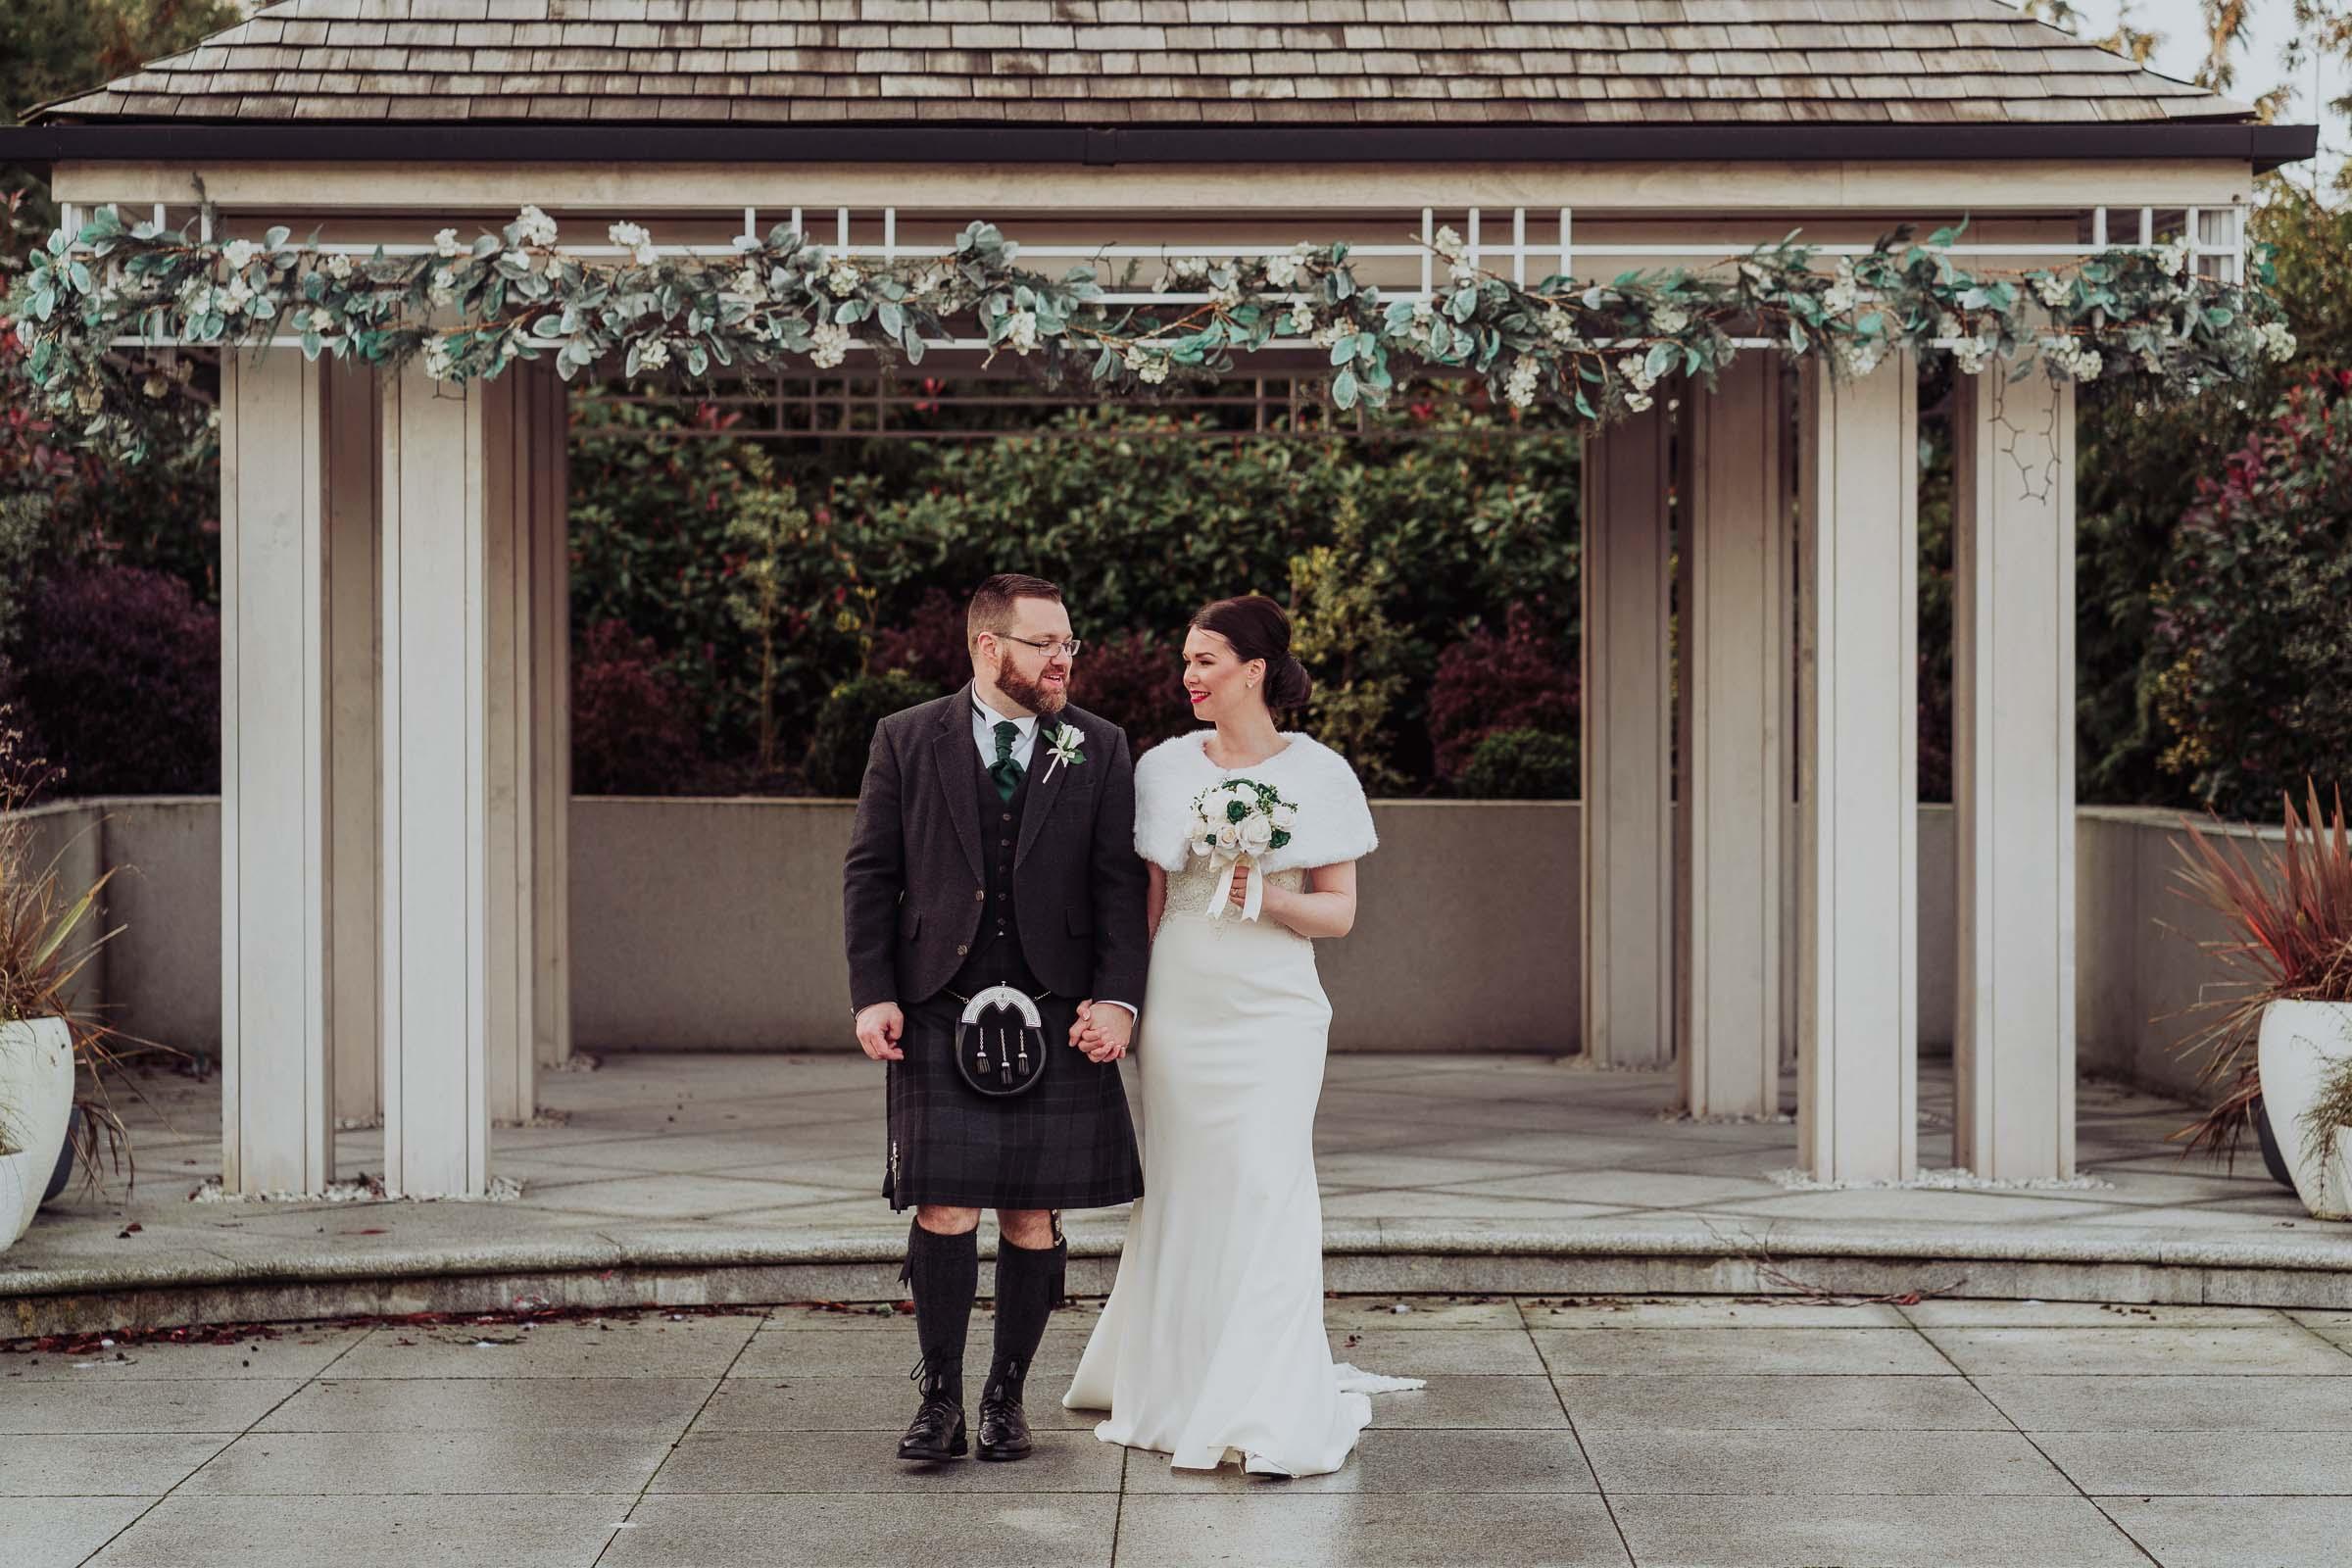 Radstone-Wedding-photographer-glasgow (4 of 5).jpg